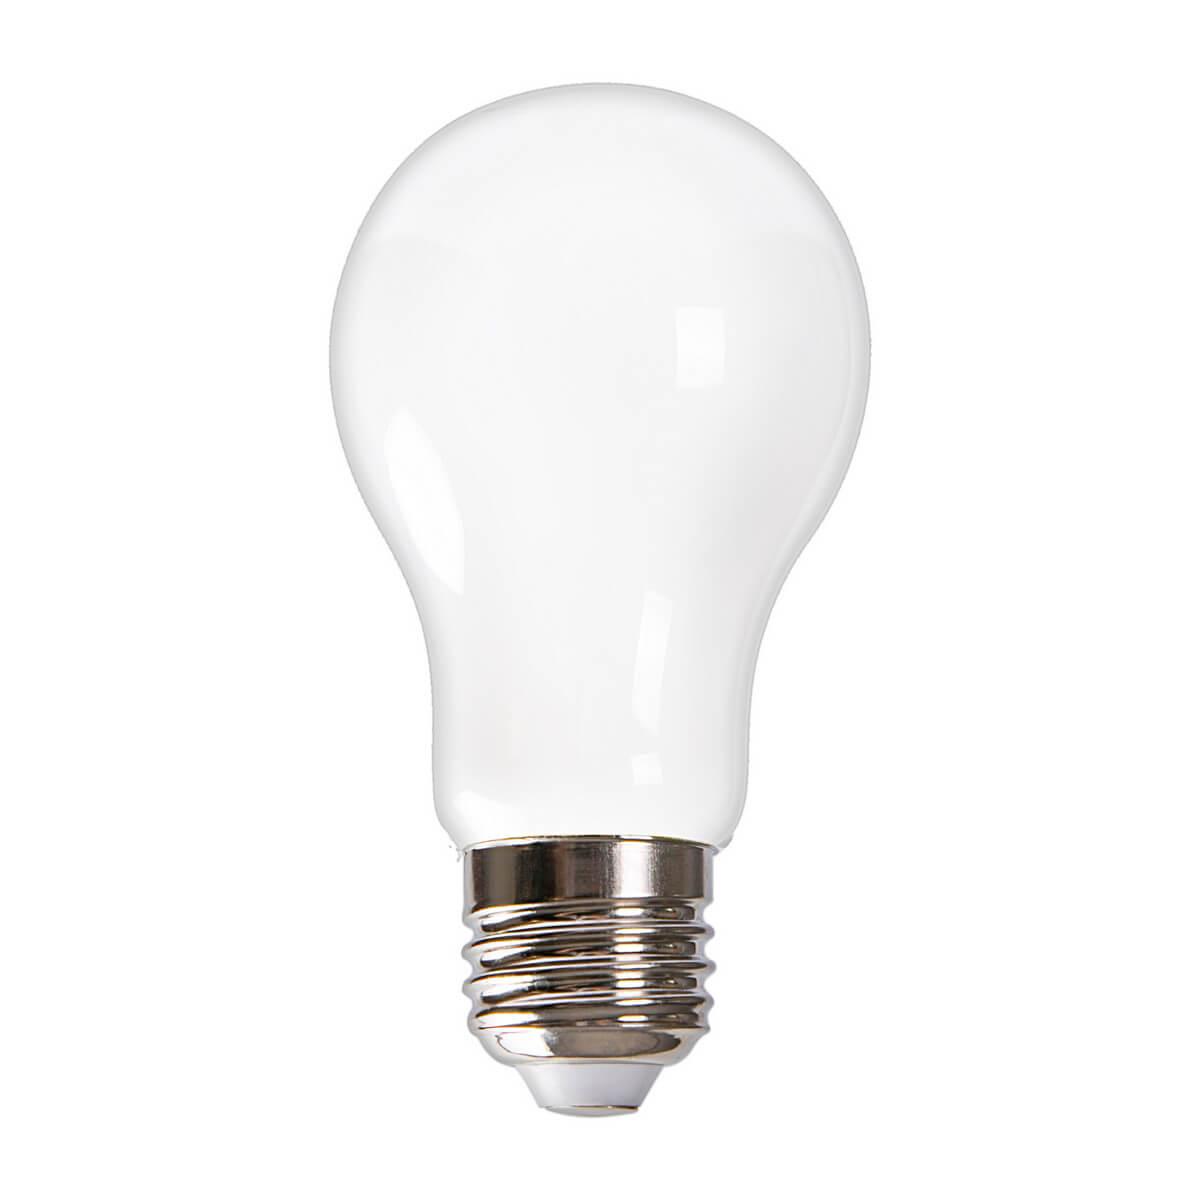 Лампочка Volpe LED-A60-7W/3000K/E27/FR GLH01WH Heaven LED-A60 эра f led a60 e27 7w 220v 2700k